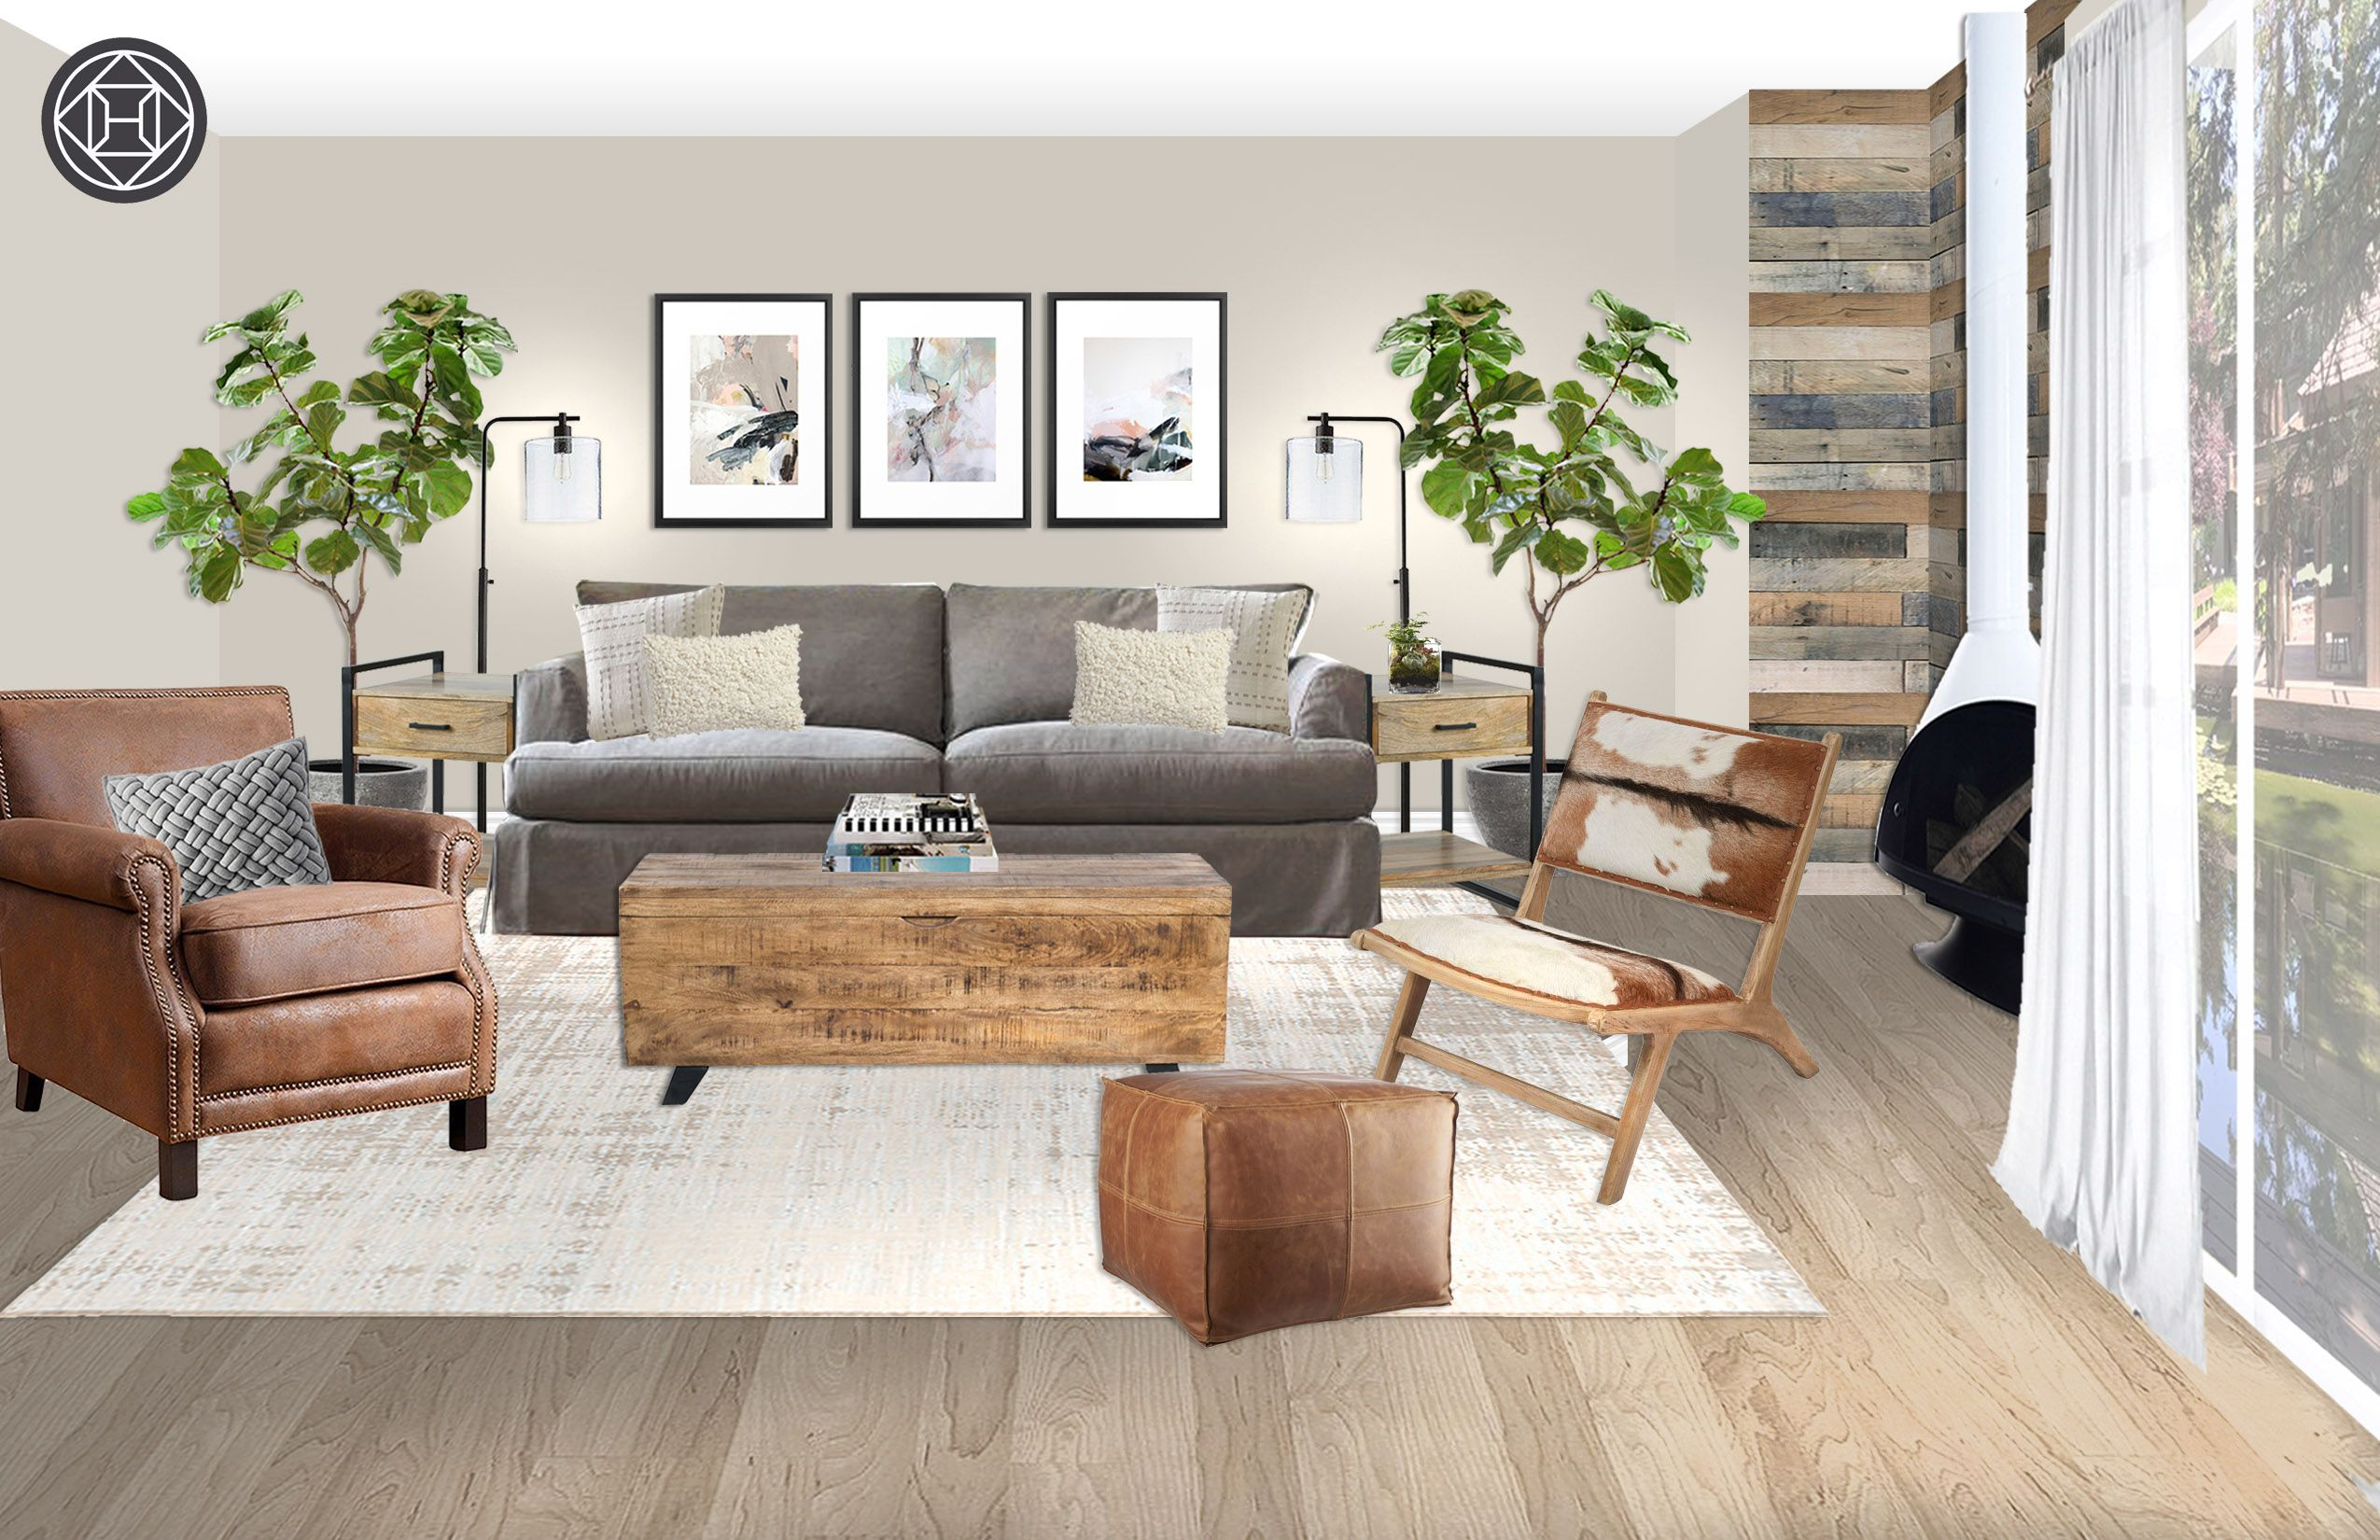 Rustic Midcentury Modern Scandinavian Living Room Design By